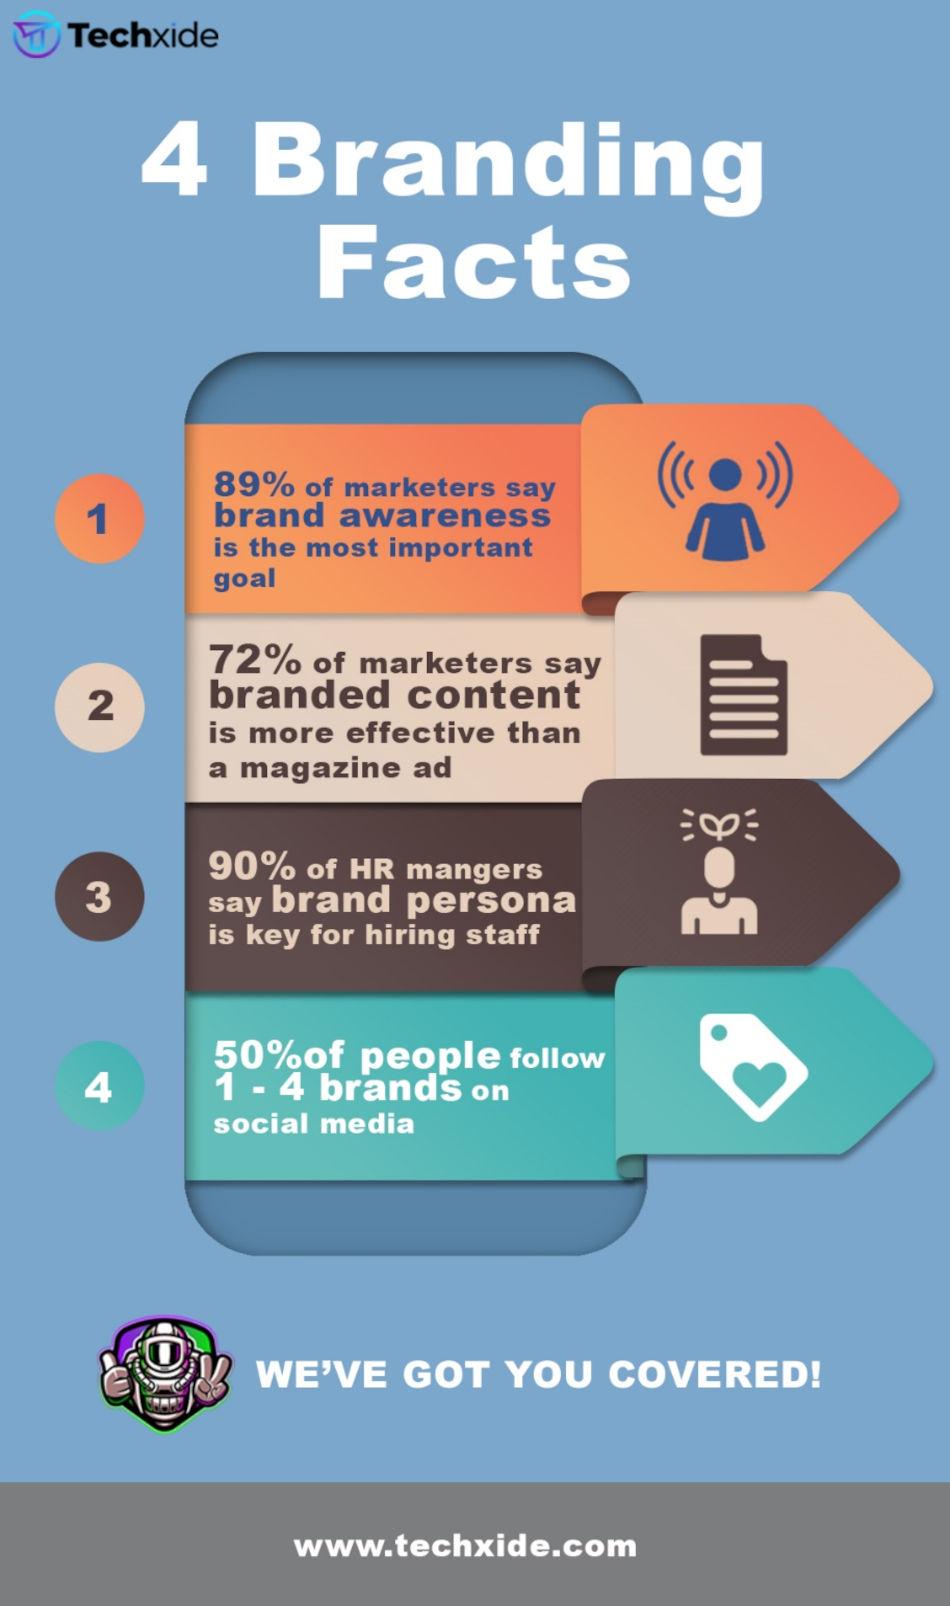 4 Branding Facts